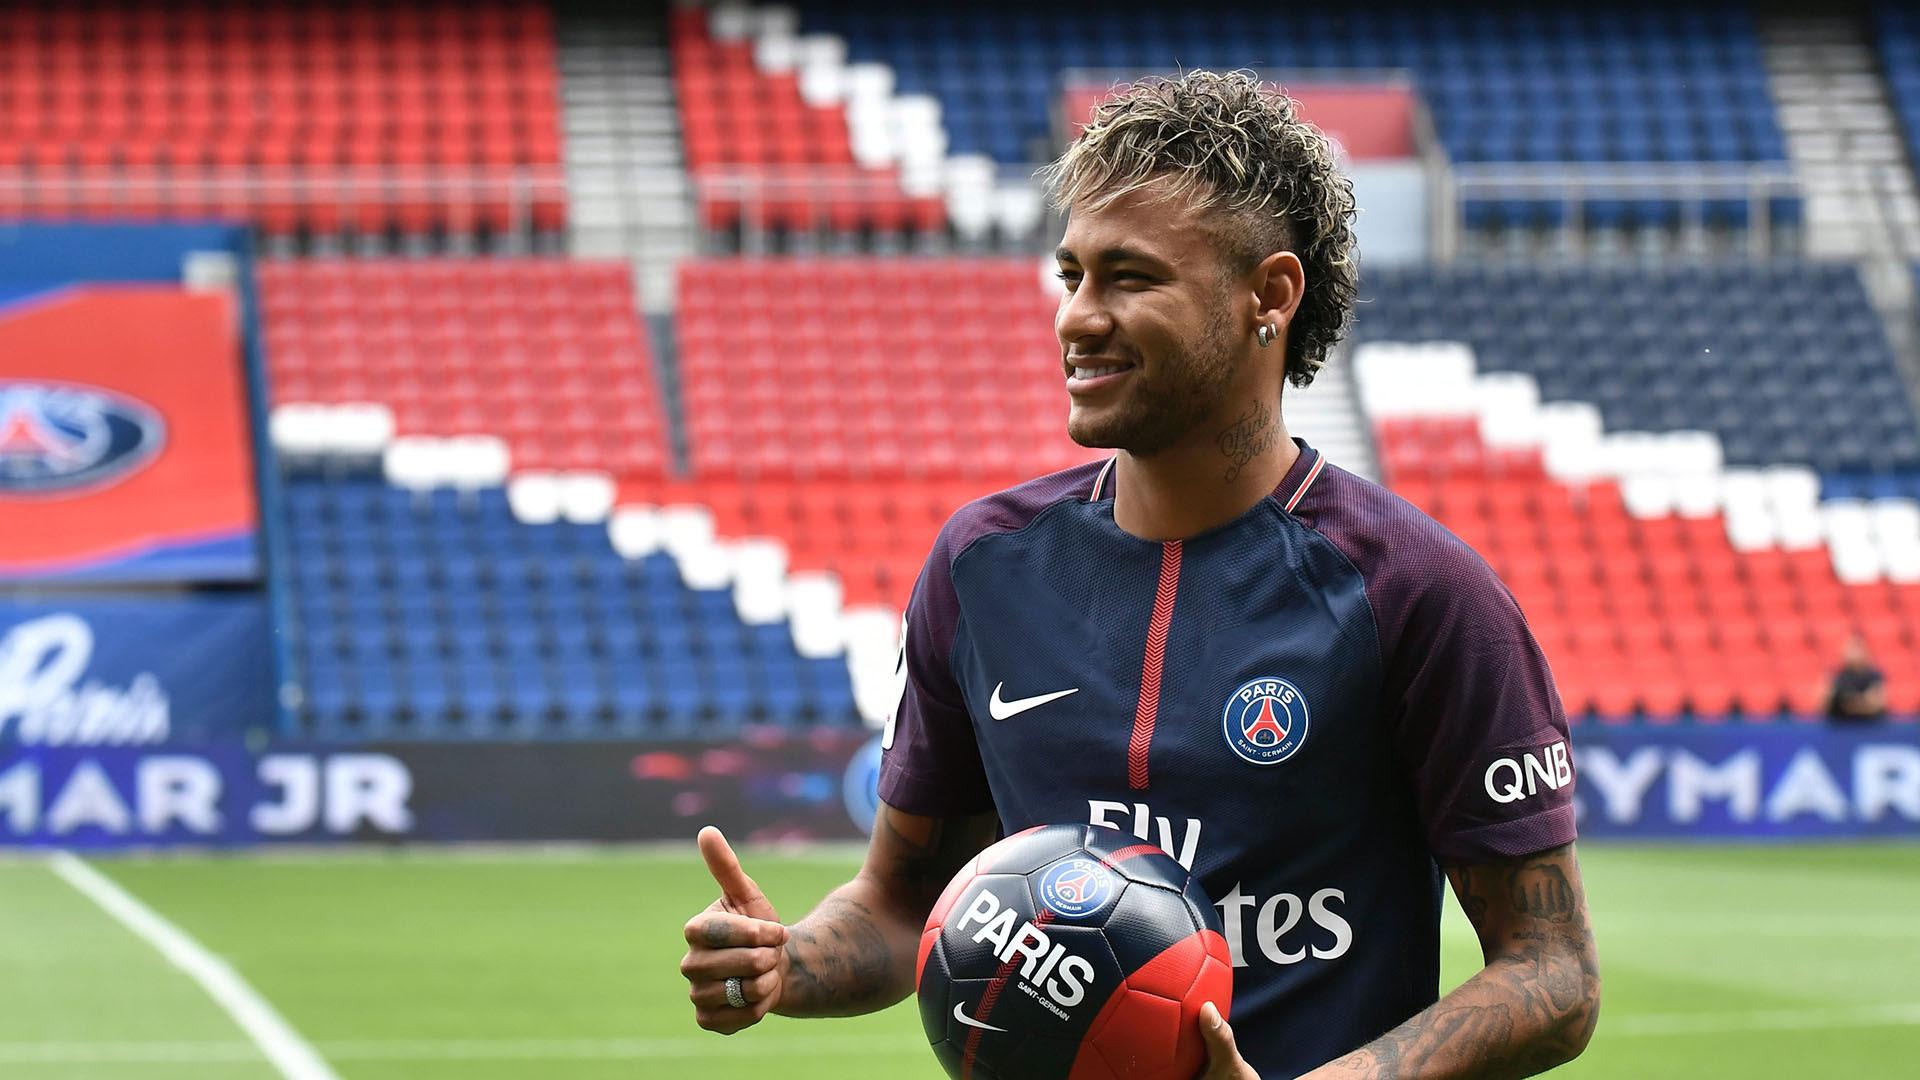 Unduh 92 Wallpaper Hd Neymar Foto HD Paling Keren